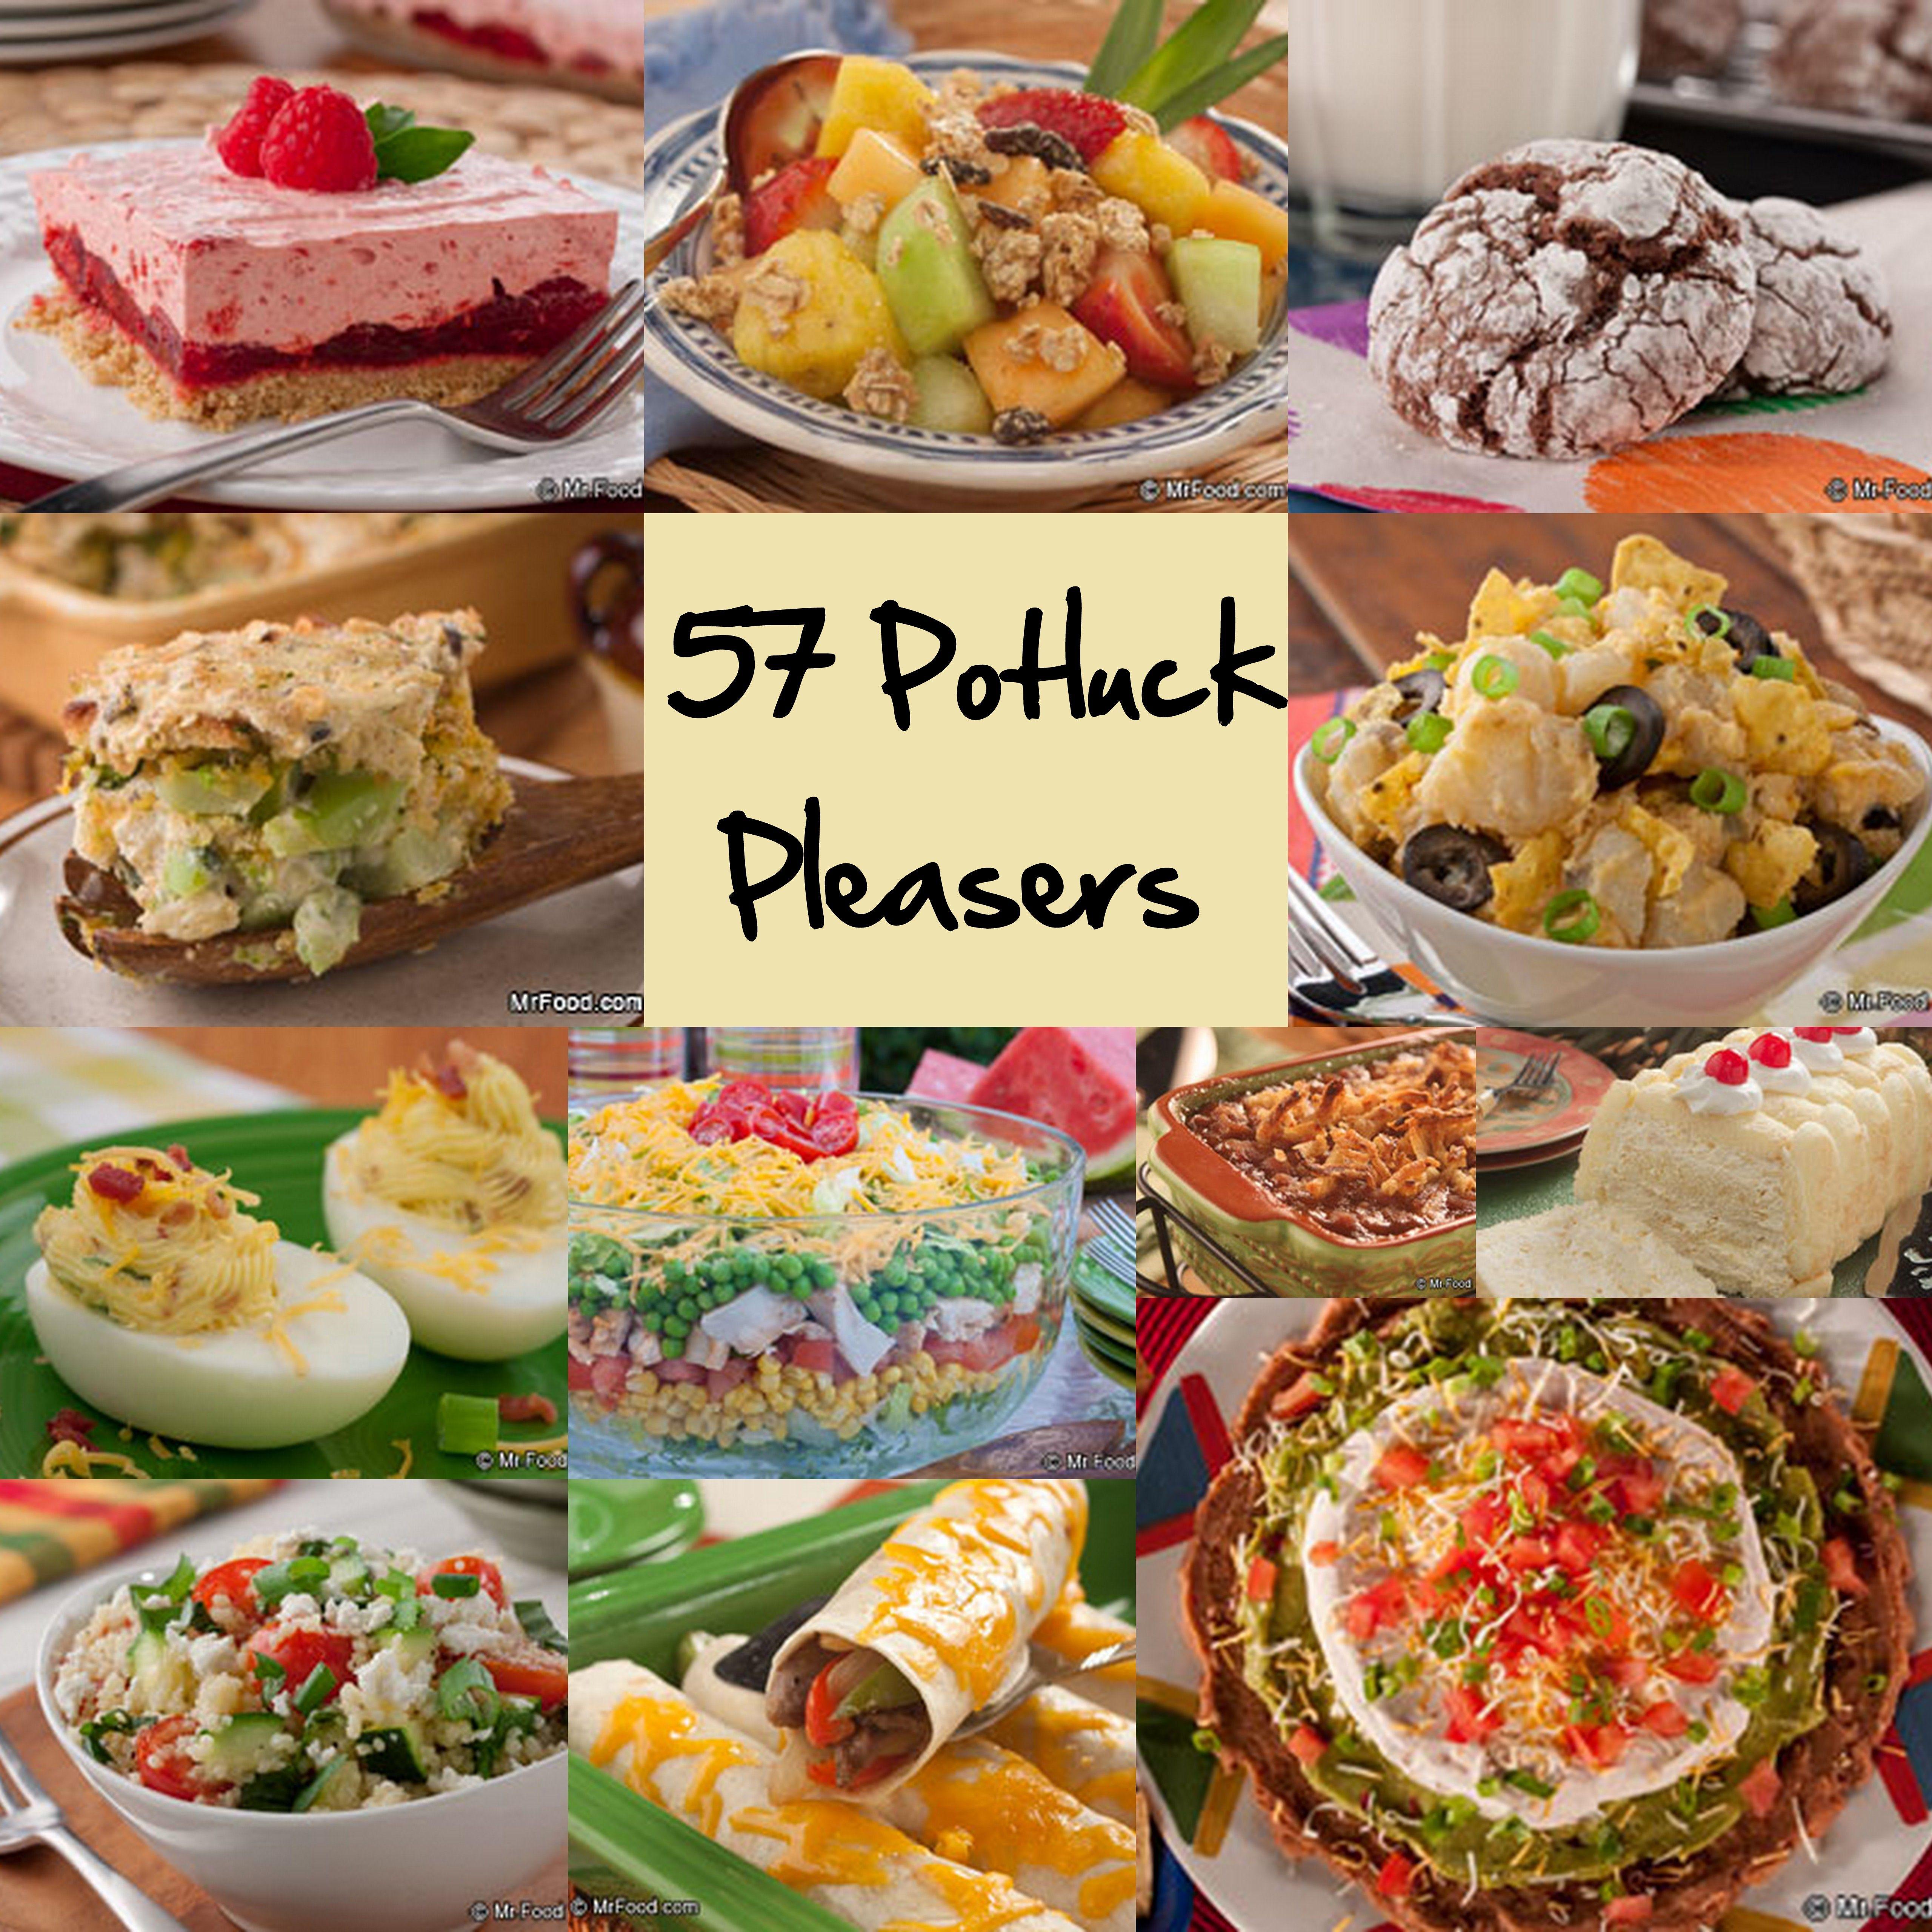 Summer Potluck Main Dishes  Easy Potluck Recipes 58 Potluck Ideas